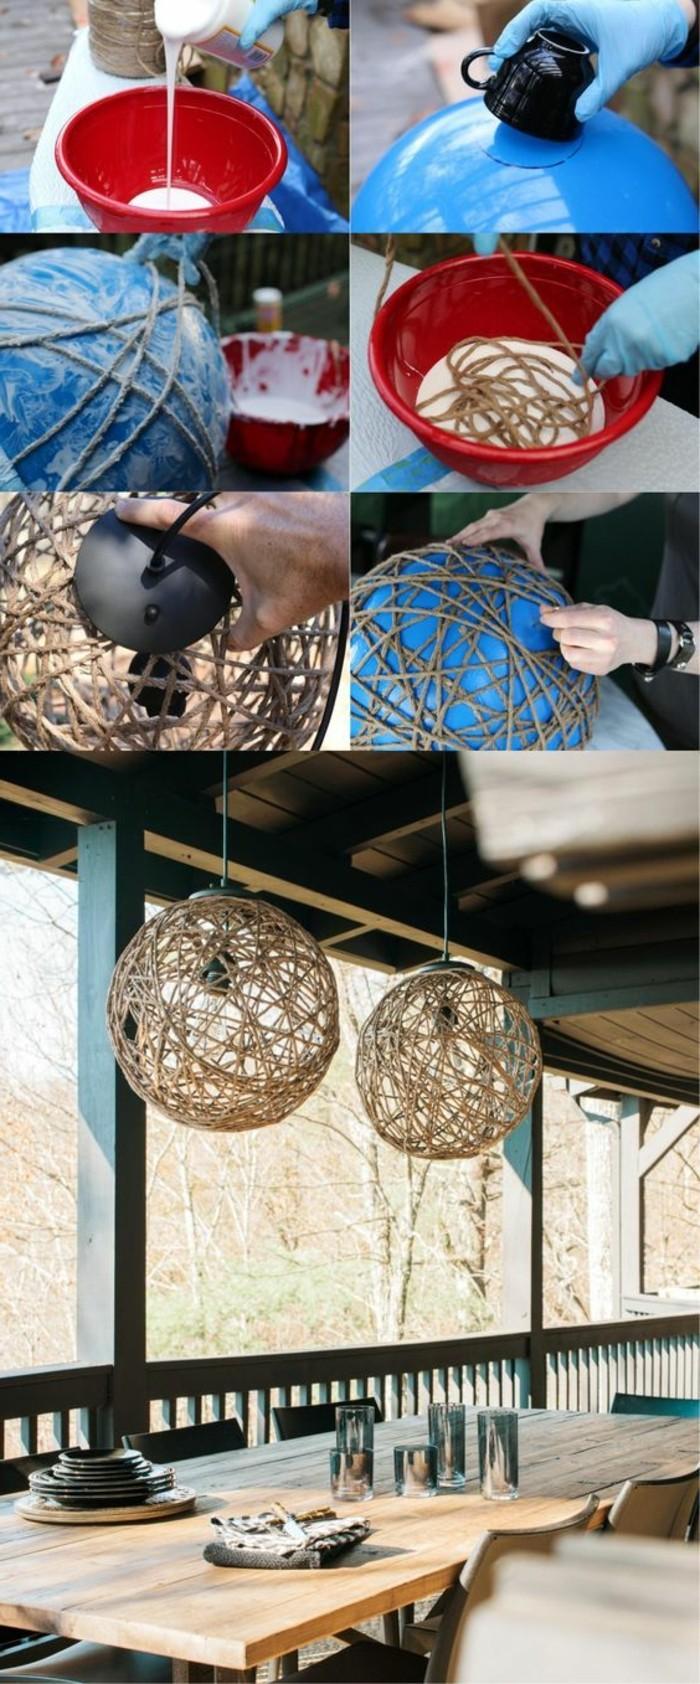 lampenschirm-basteln-balon-seile-kleber-handschuhe-tische